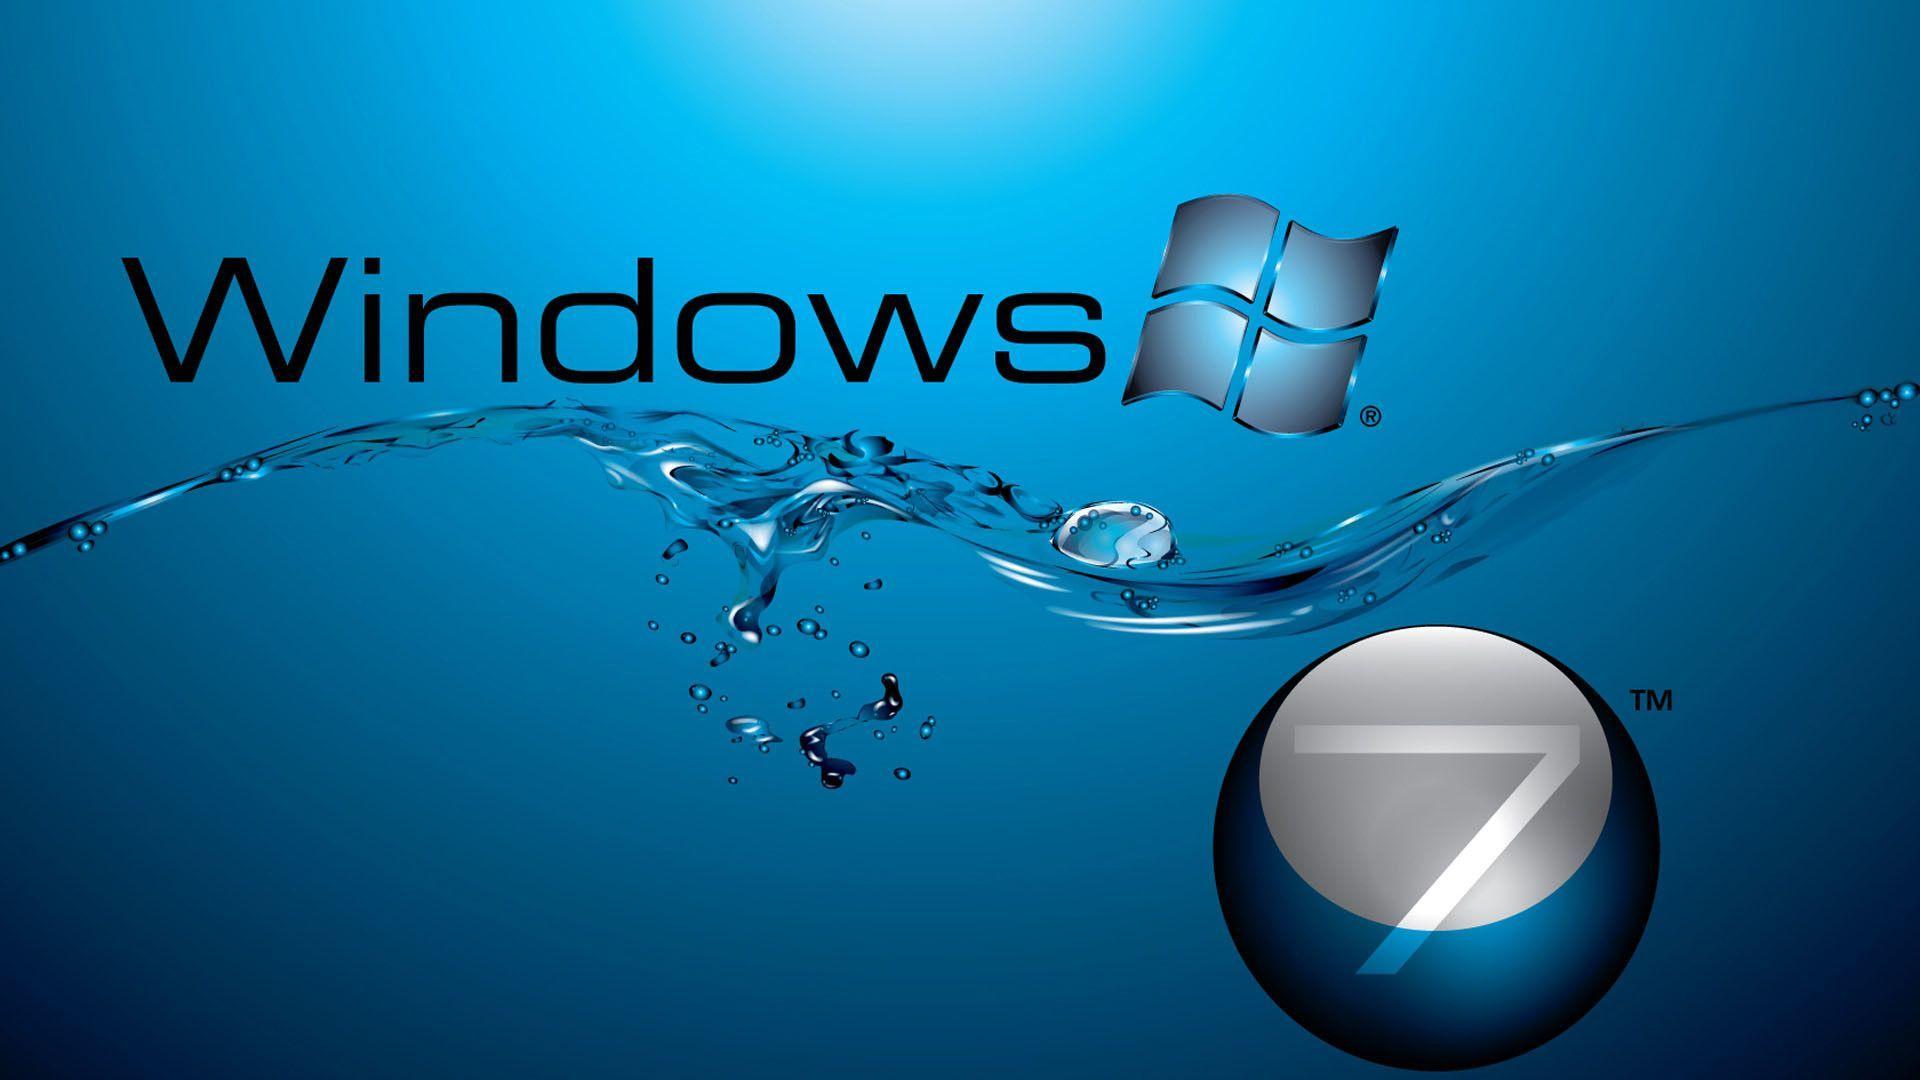 19201080 Hd Wallpaper For Windows 7 19201080 4k Windows Wallpaper 3d Desktop Wallpaper Windows Desktop Wallpaper